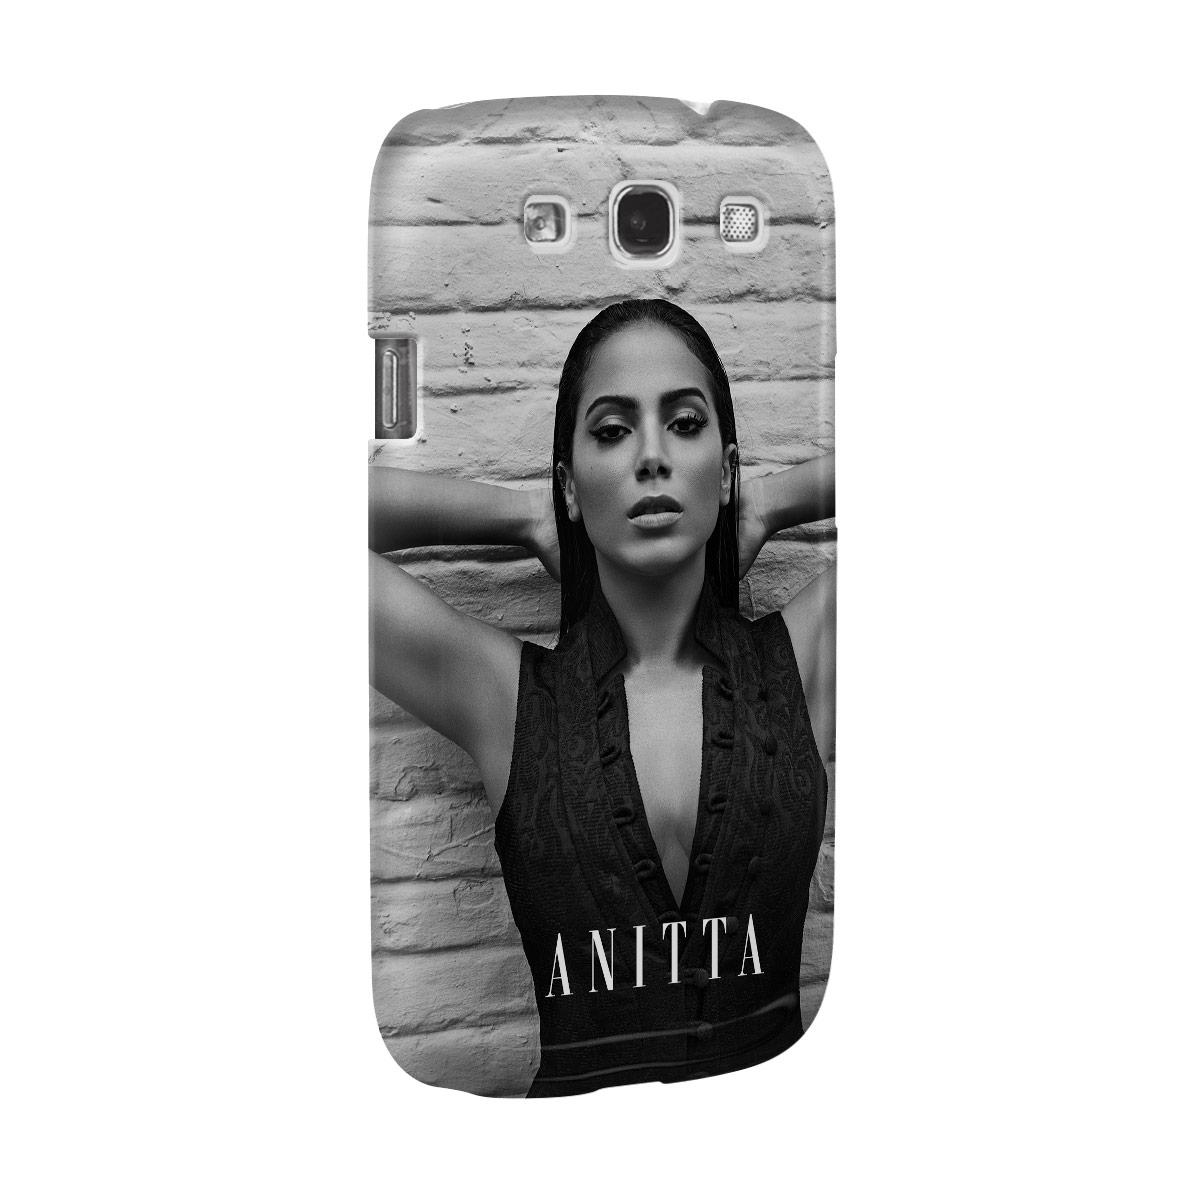 Capa para Samsung Galaxy S3 Anitta P&B